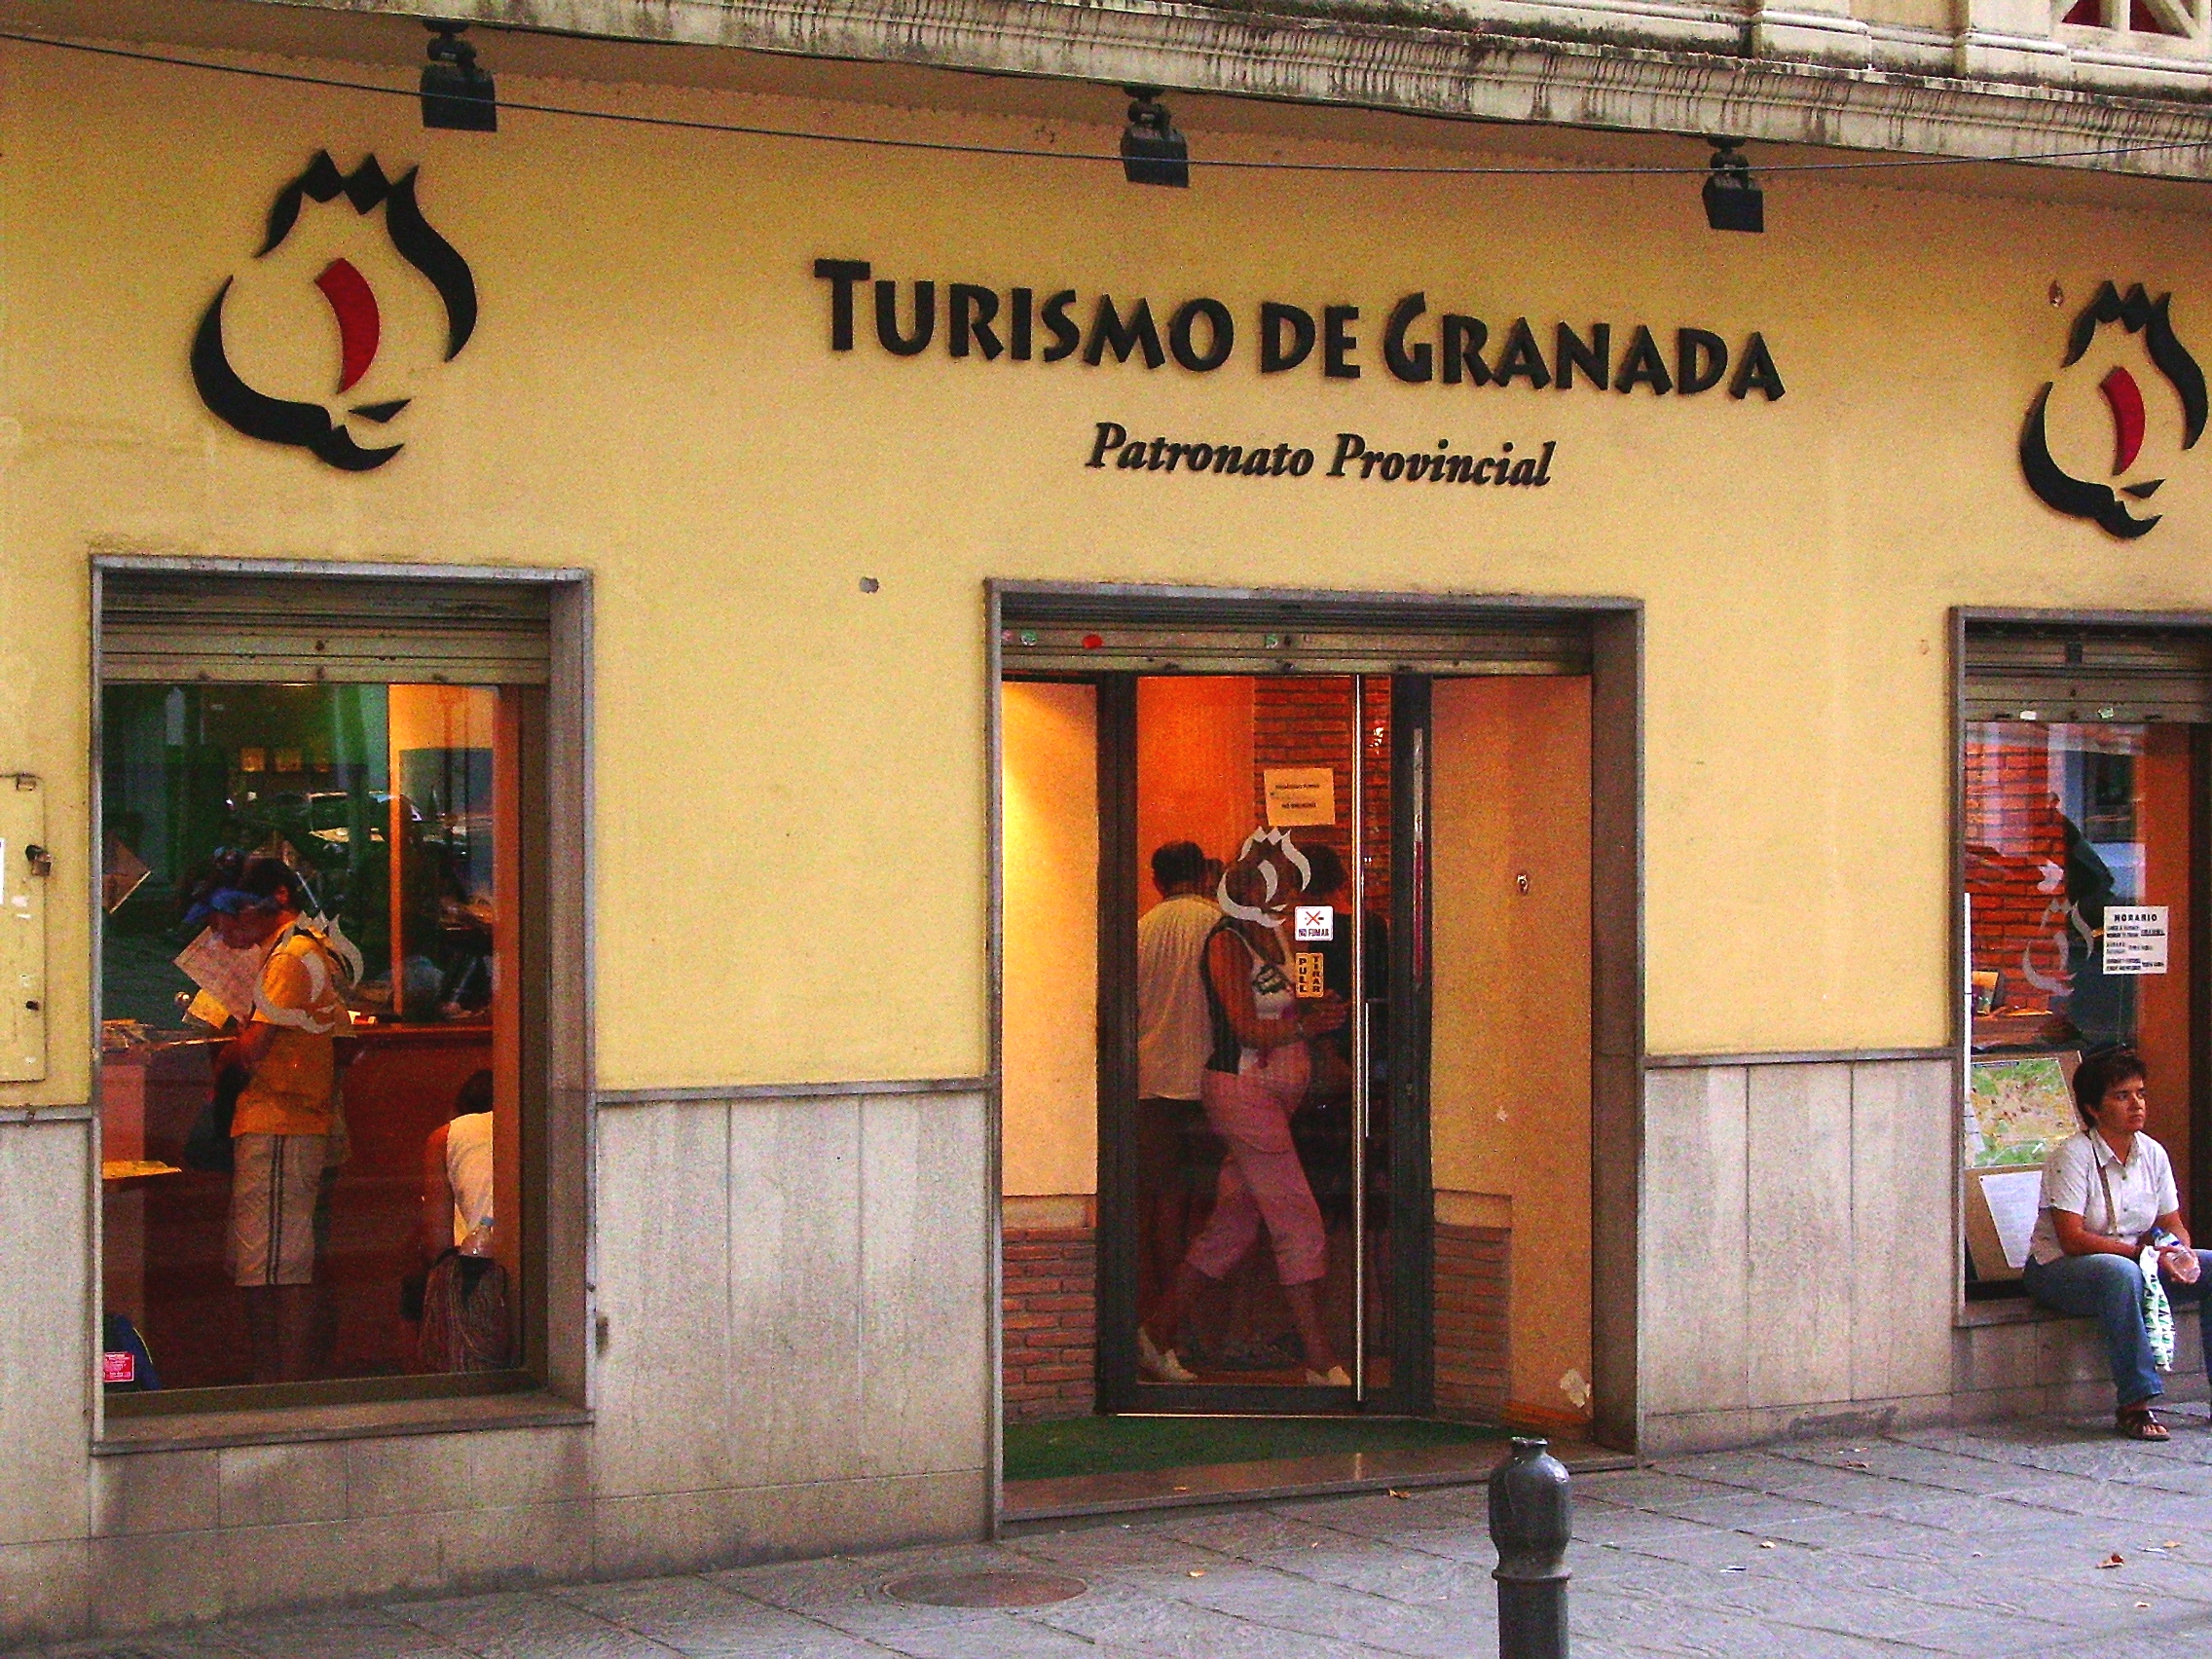 oficina del patronato provincial de turismo